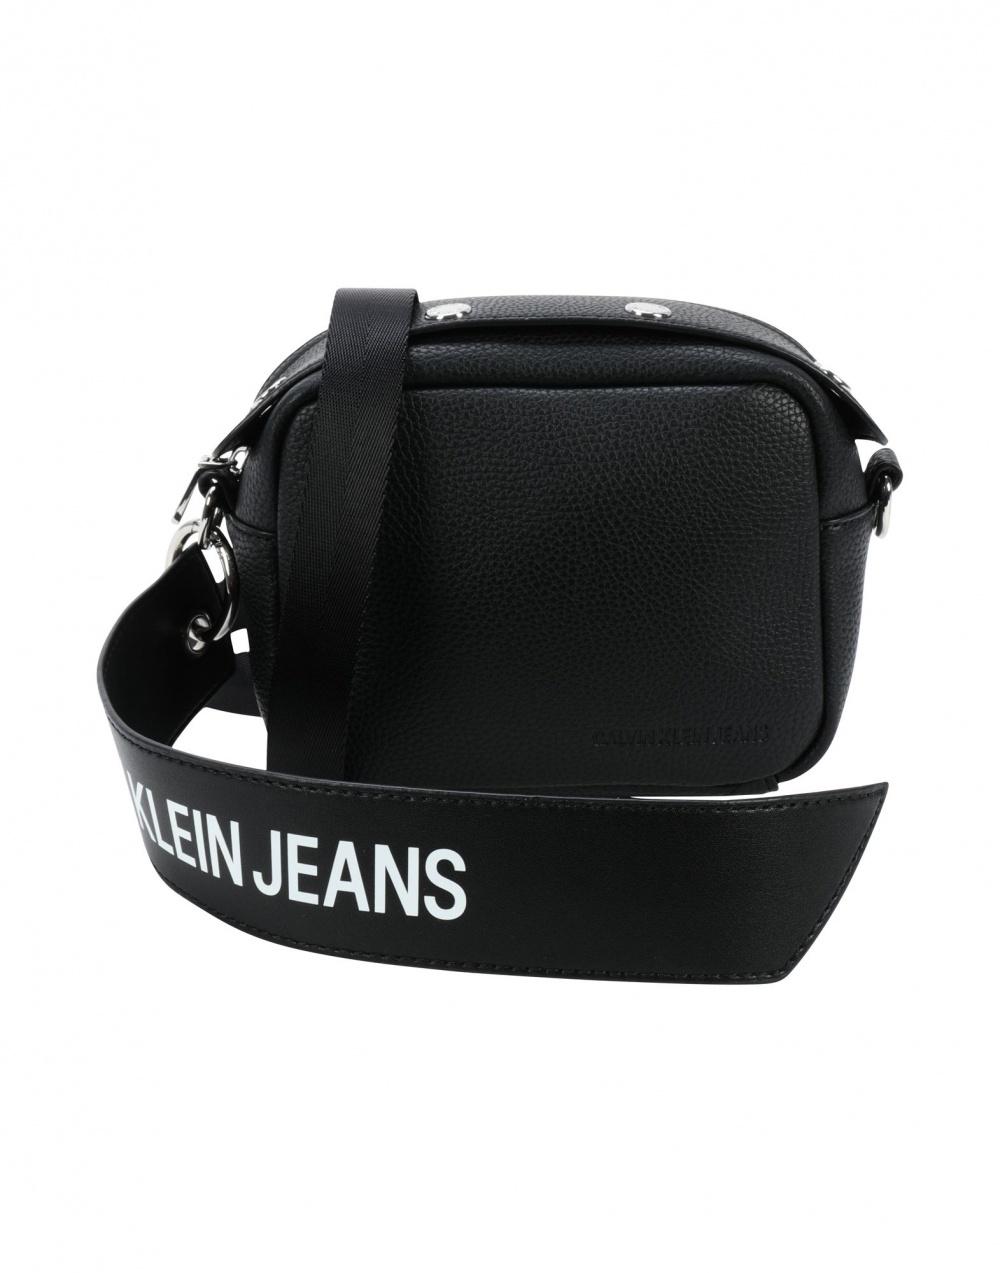 Сумка calvin klein jeans, размер small